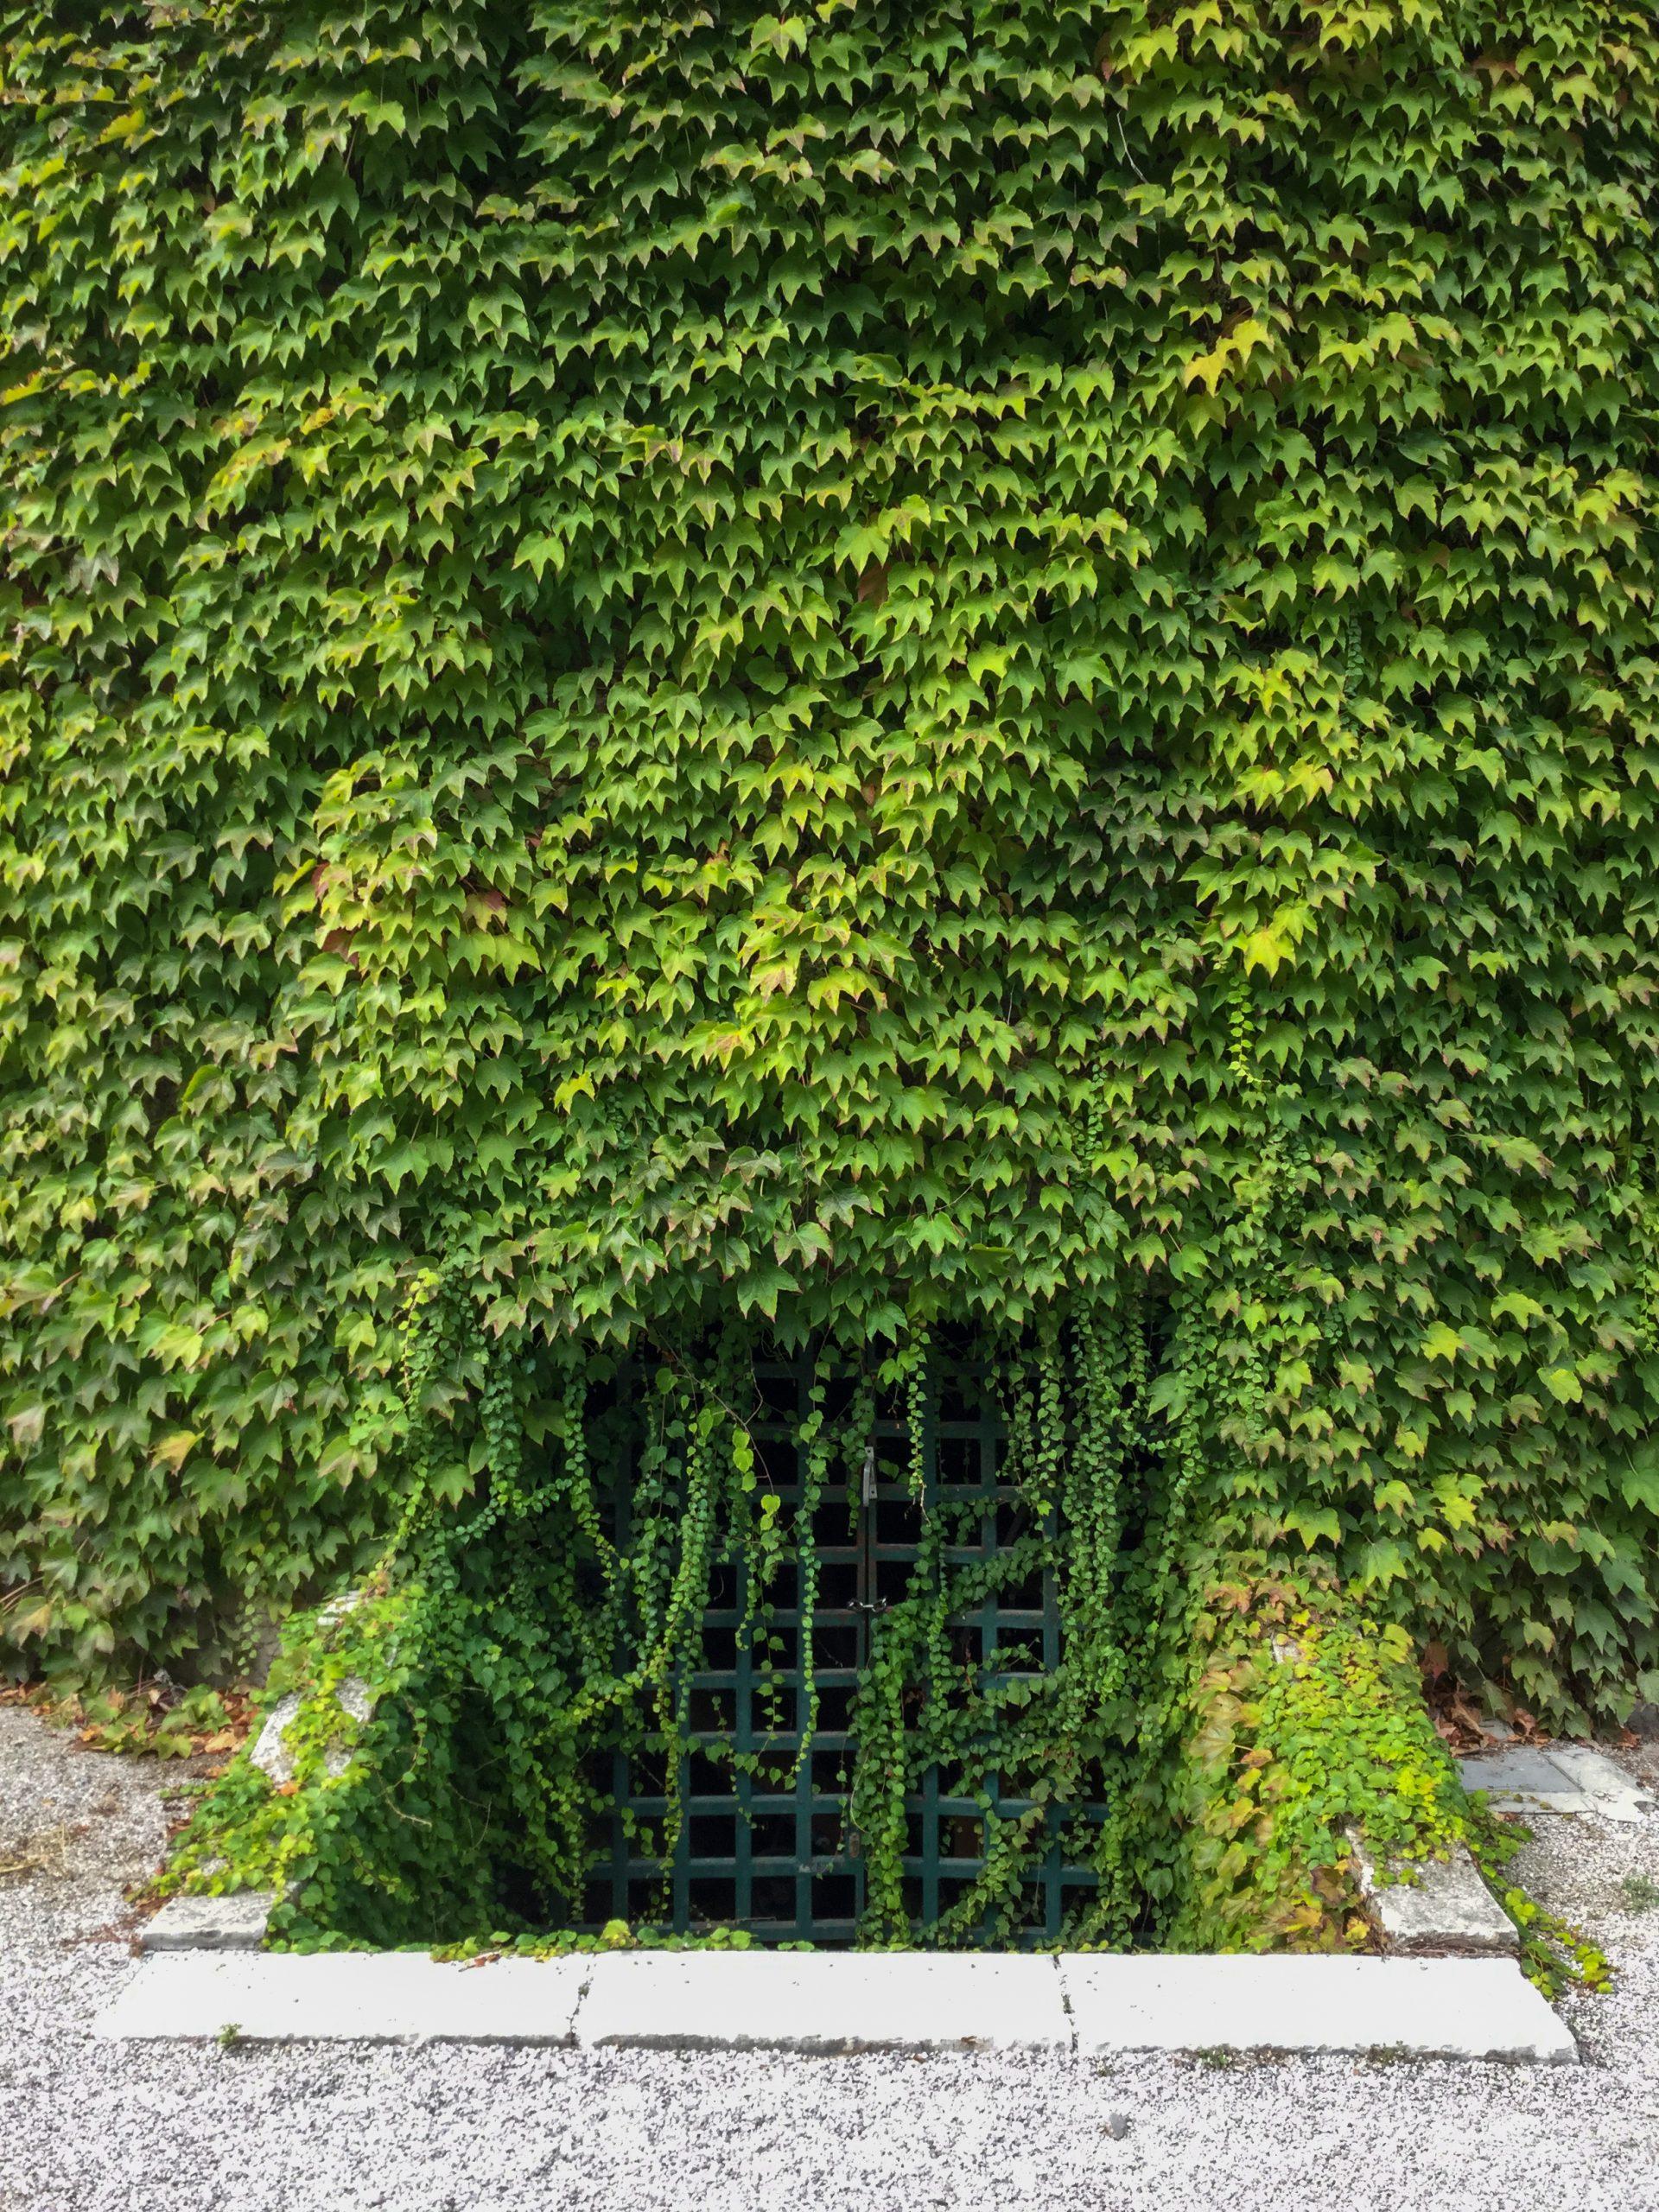 Potentially Dangerous Crawlspace Entrance Halifax